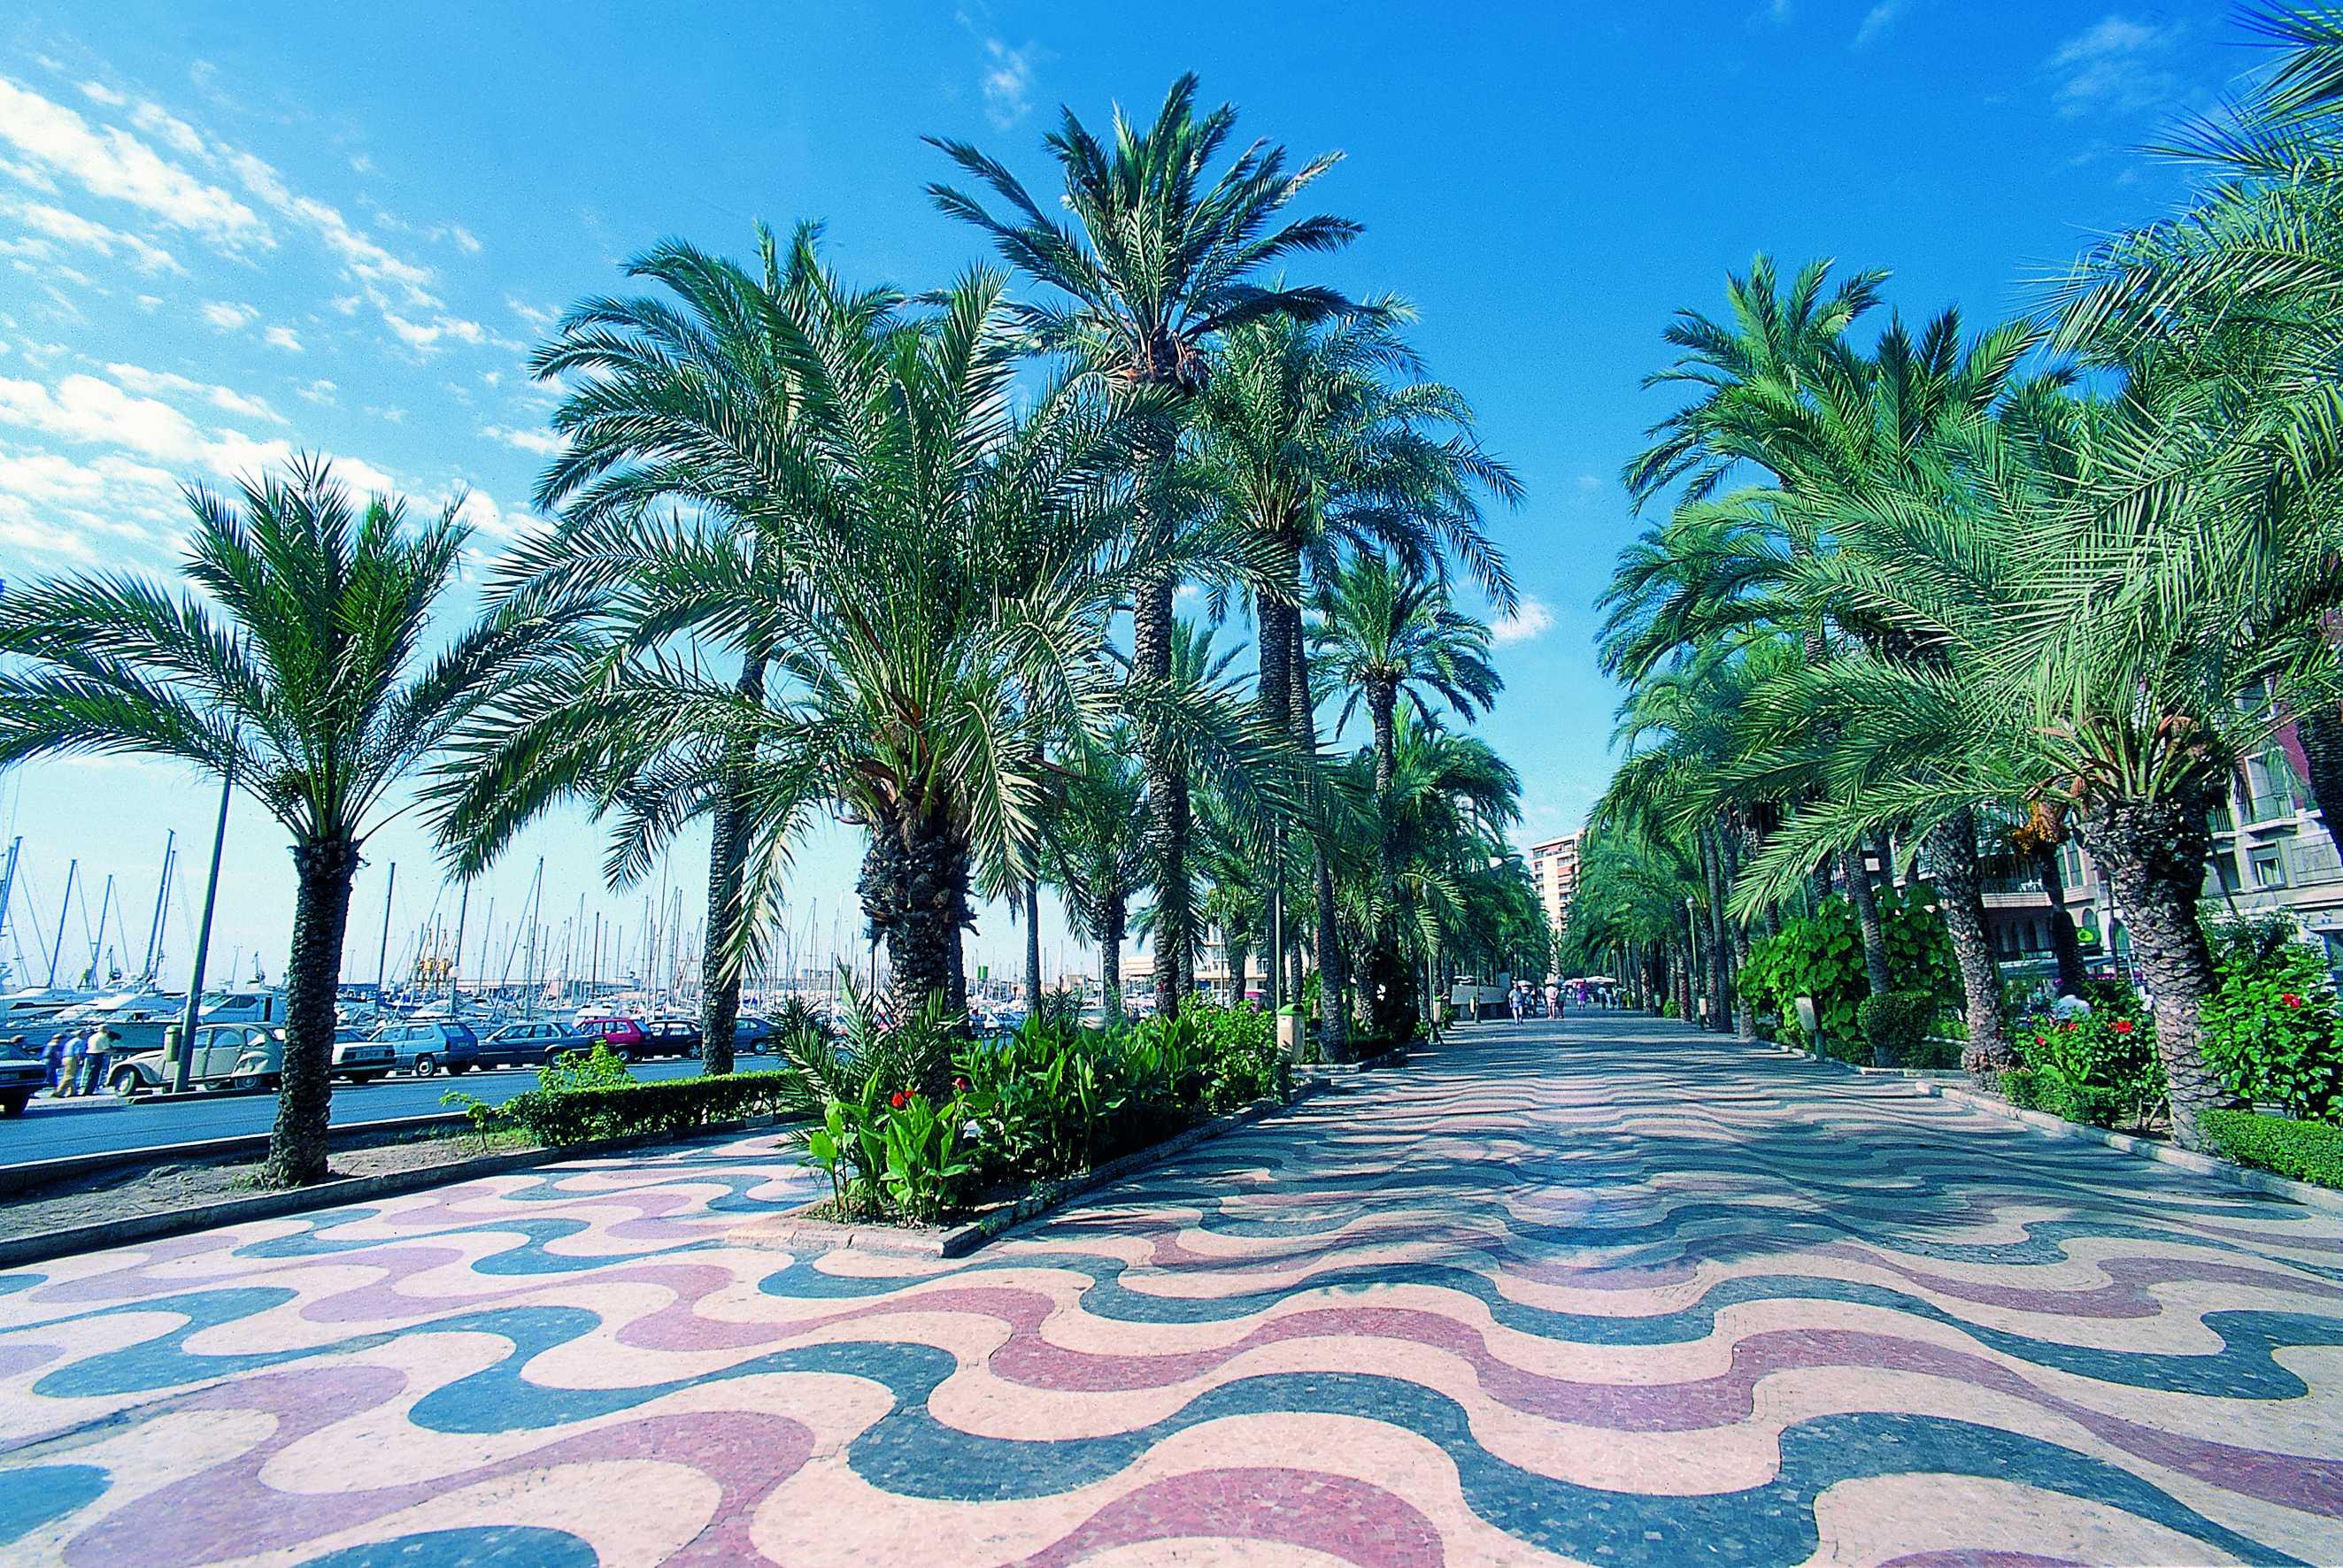 Alicante Visitas Guiadas Gratis Alicante Free Tours